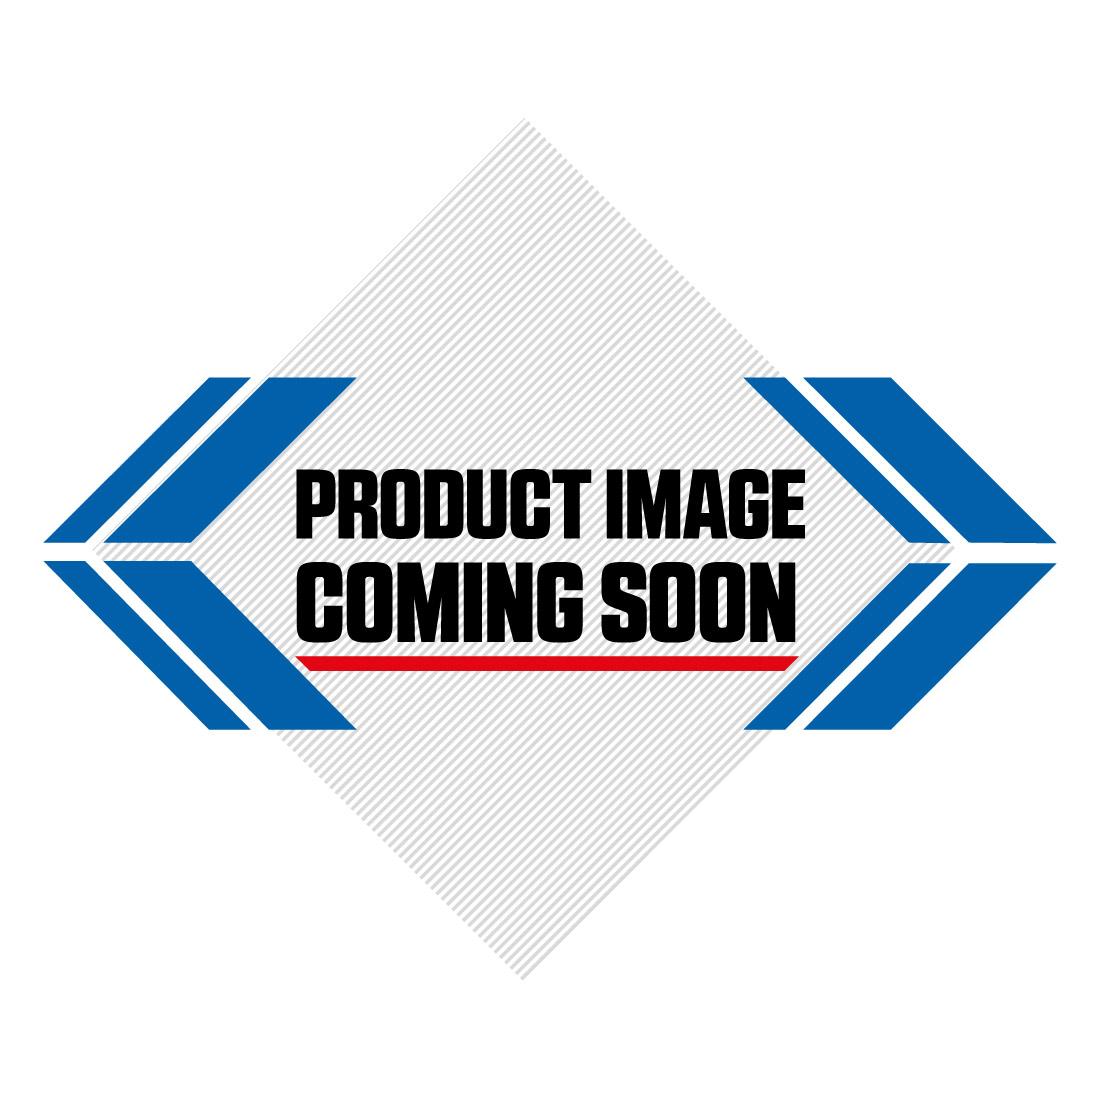 Renthal Twinring Rear Sprocket KTM SX SX-F EXC EXC-F Husqvarna TC FC TE FE - Black Image-2